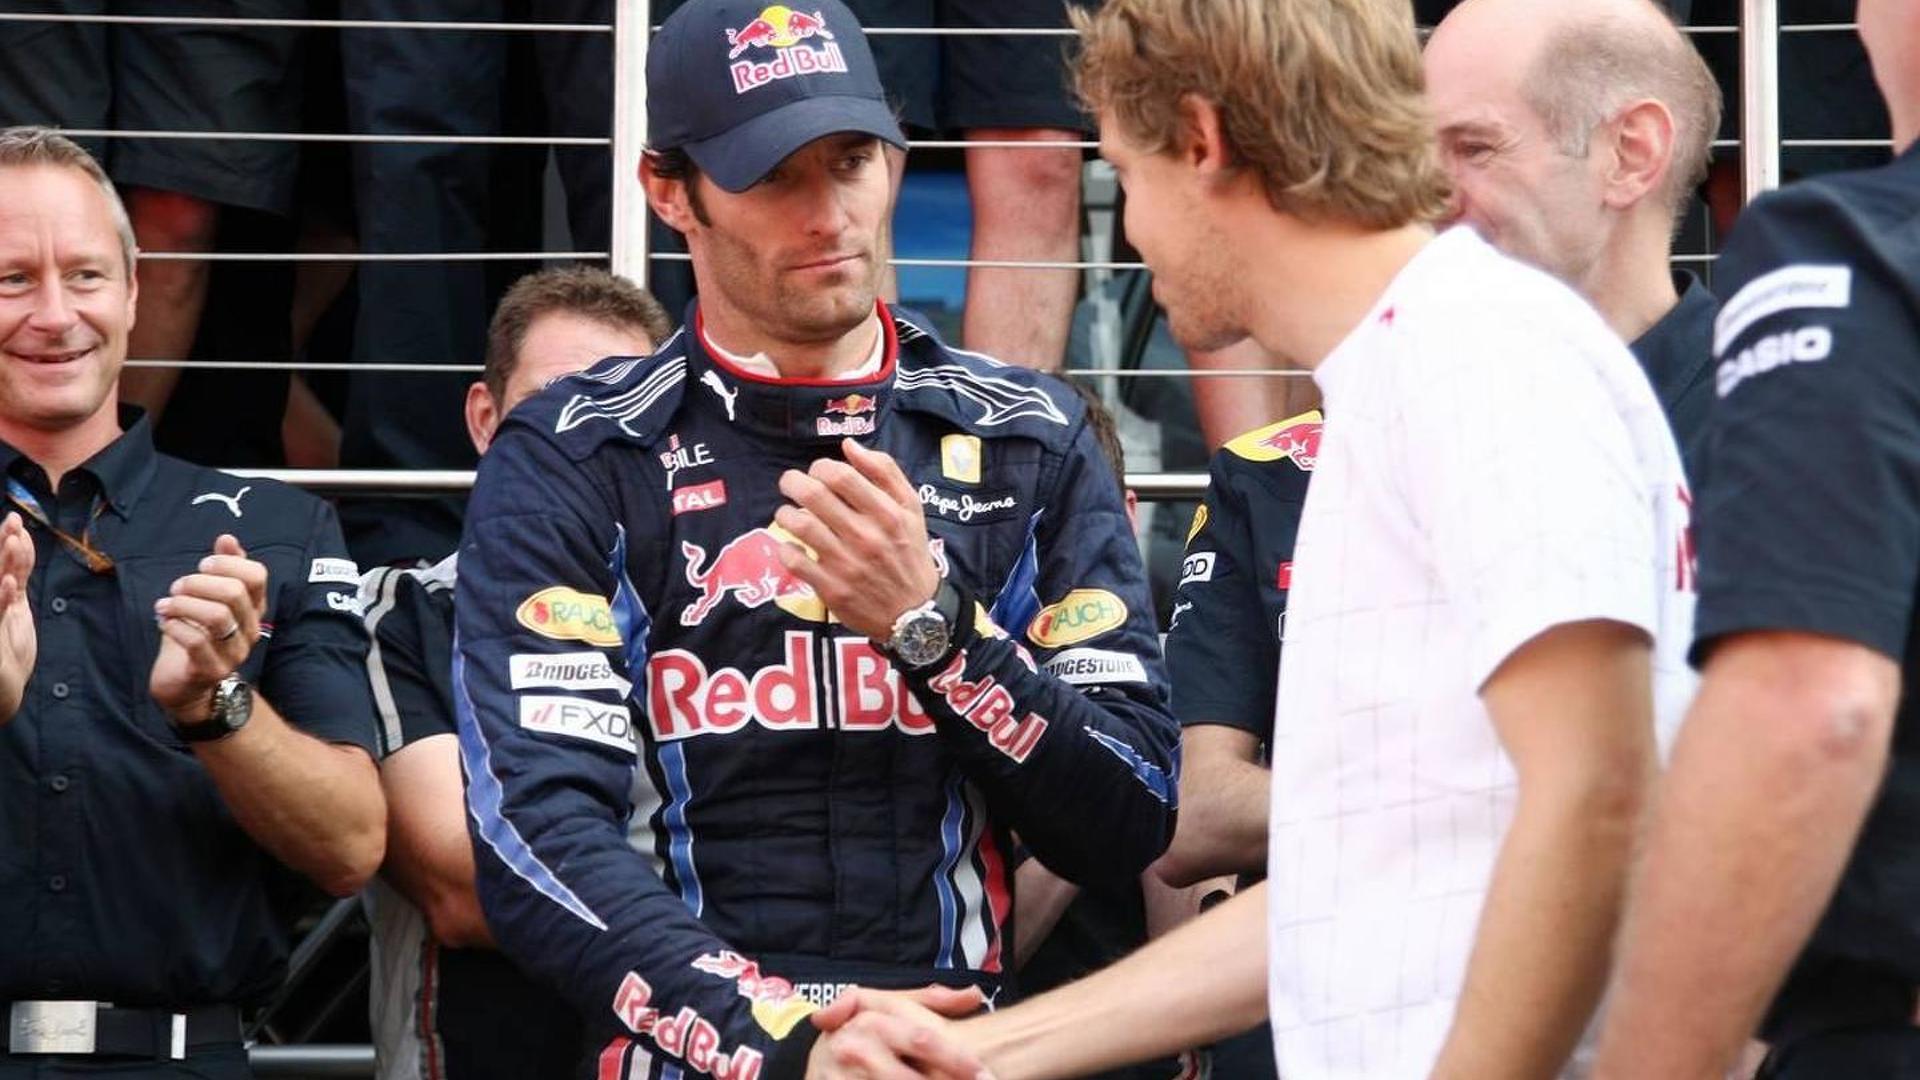 Webber's bad mood with Vettel started in 2007 - Marko